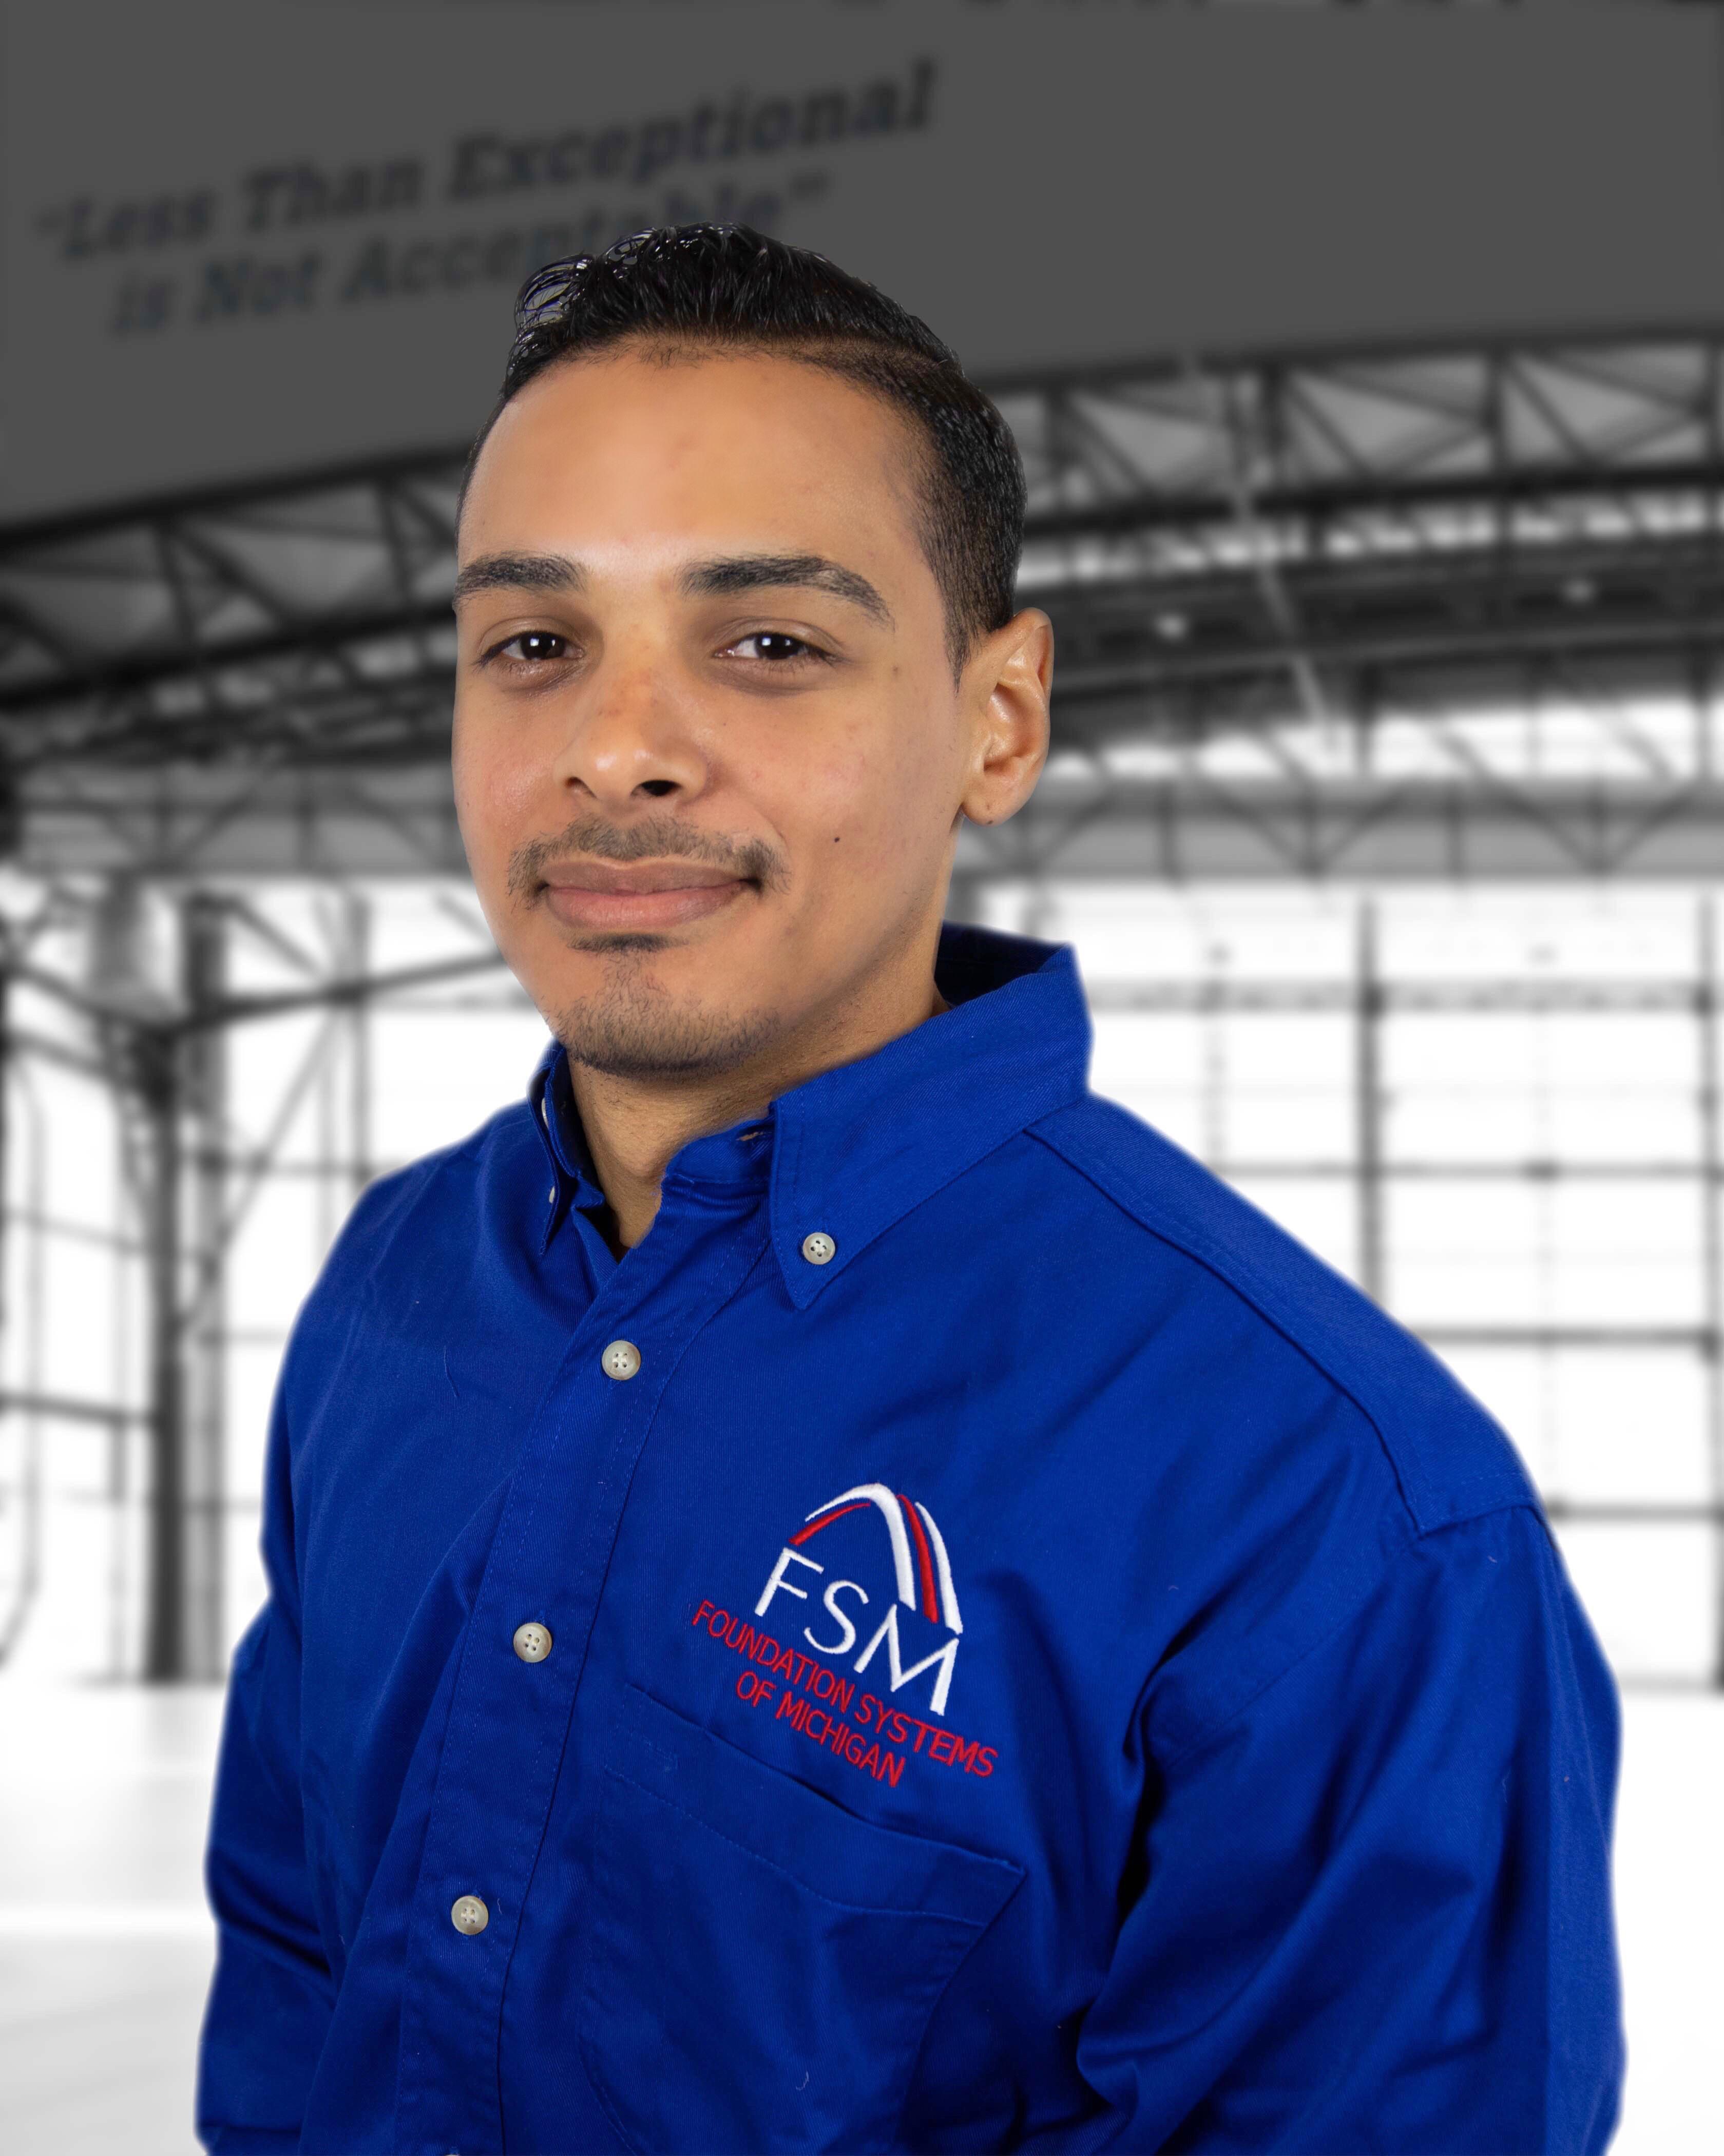 FSM Hector Ortiz Foreman